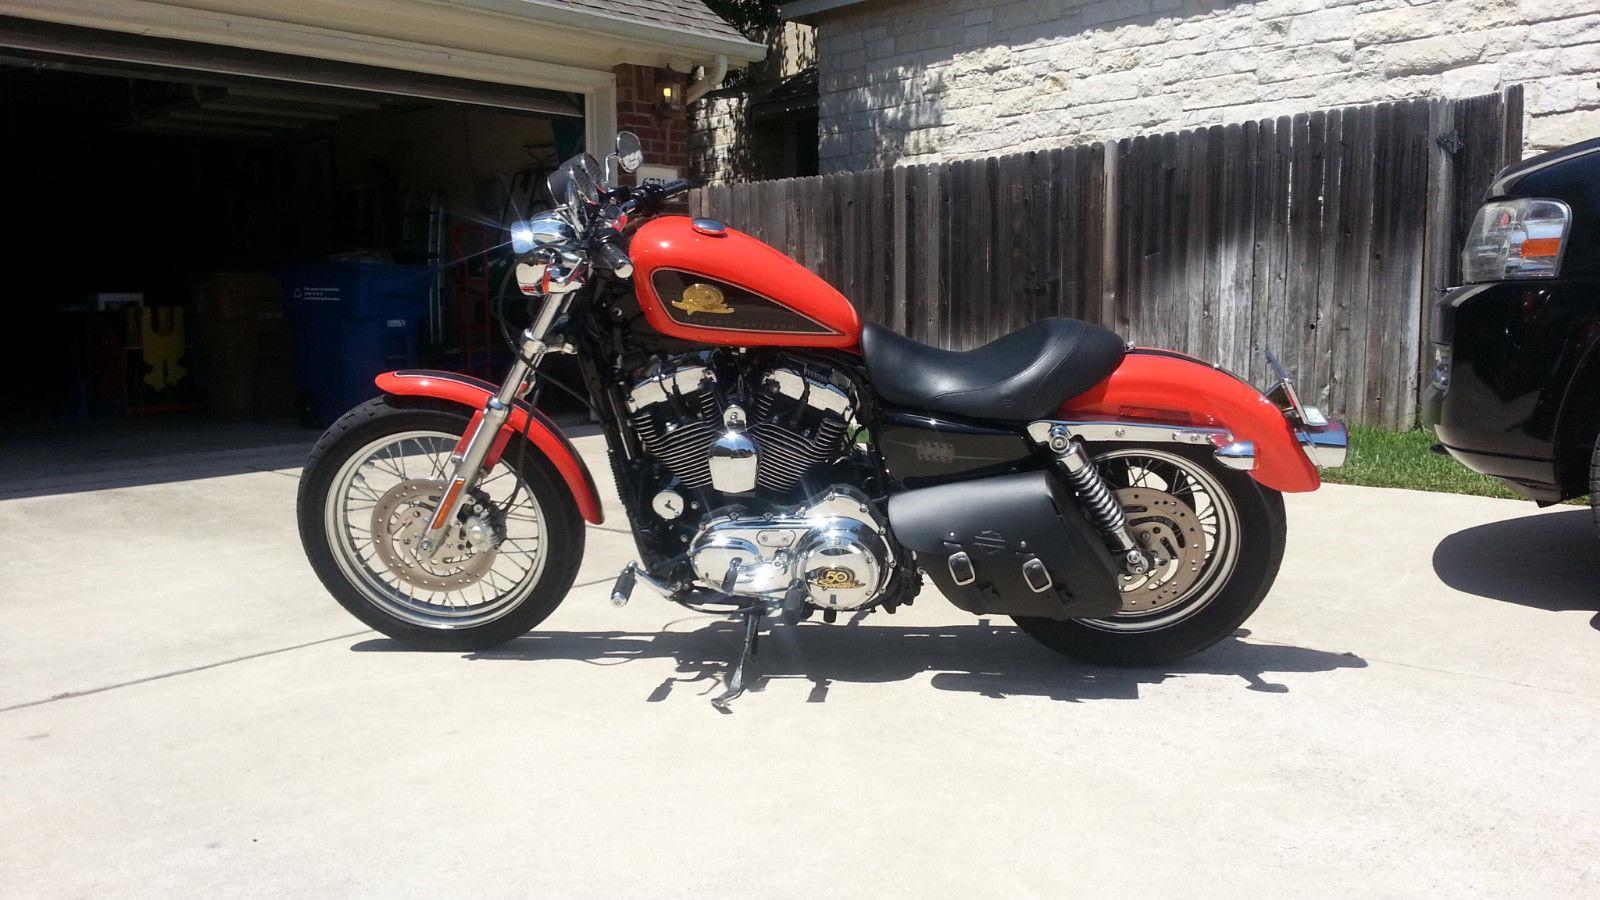 2007 Harley Davidson Sportster Xl50 Limited Edition 50th